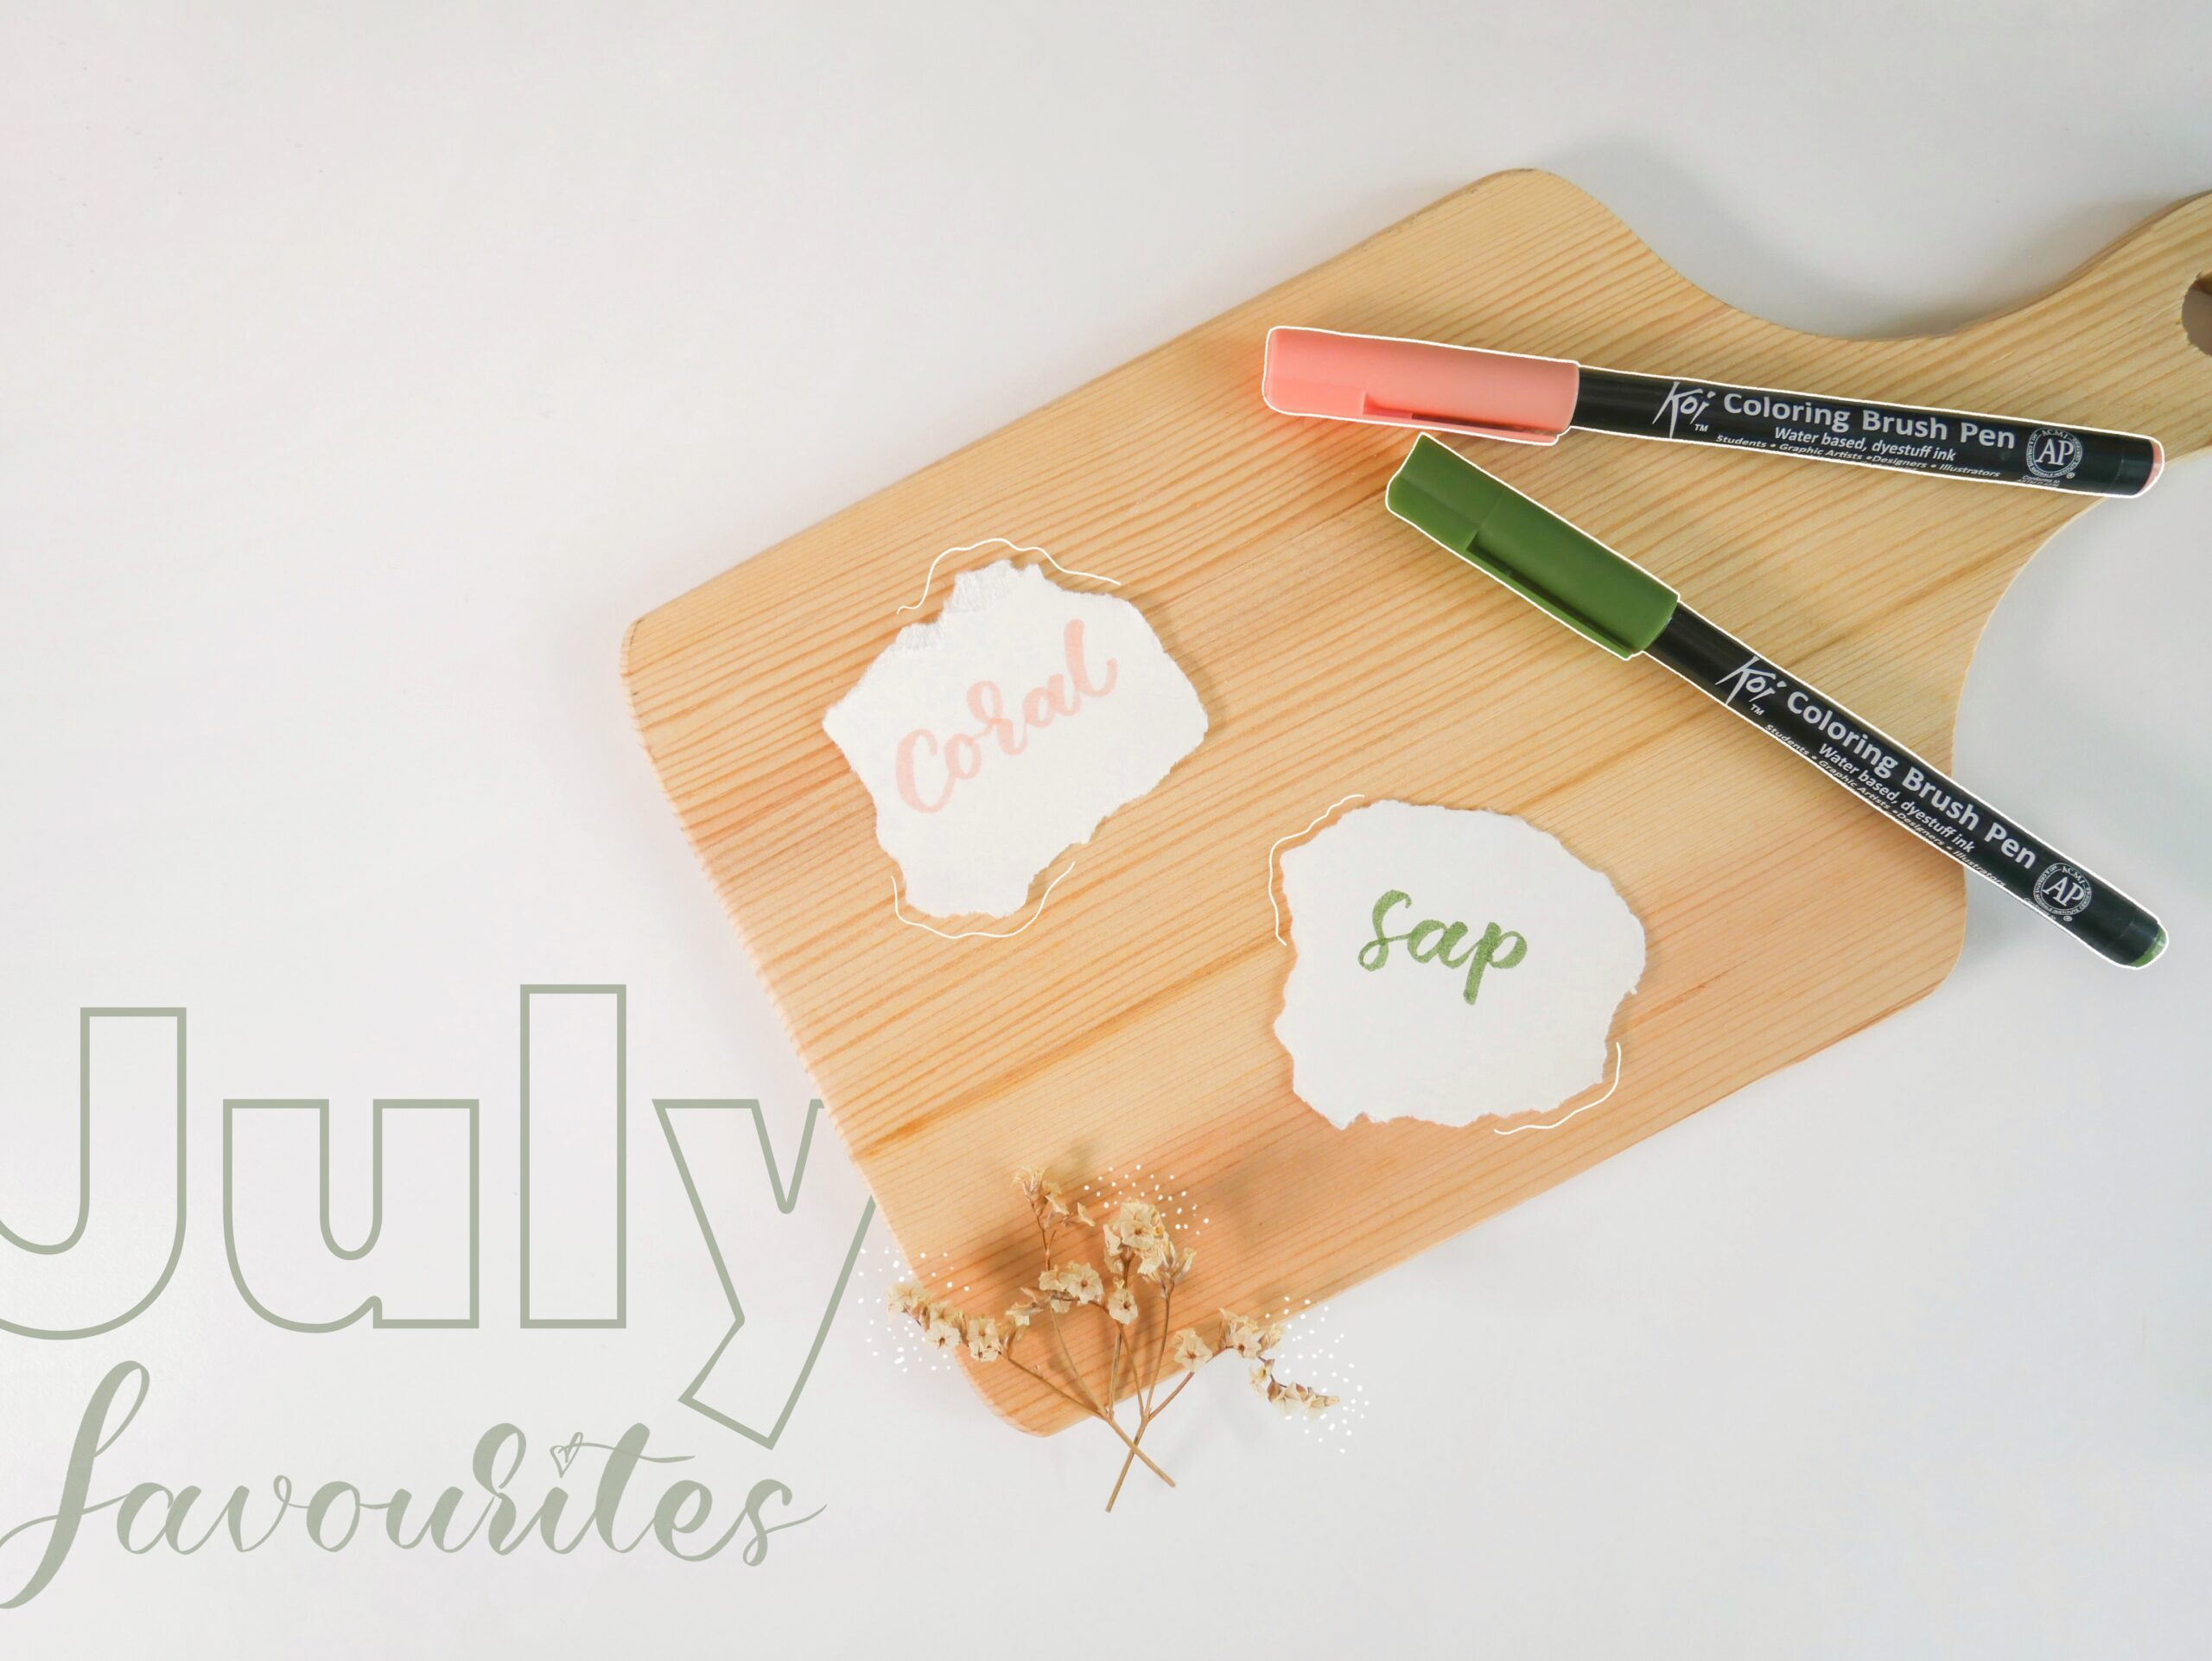 Koi Colouring Brush Pens Sap Green & Coral Red